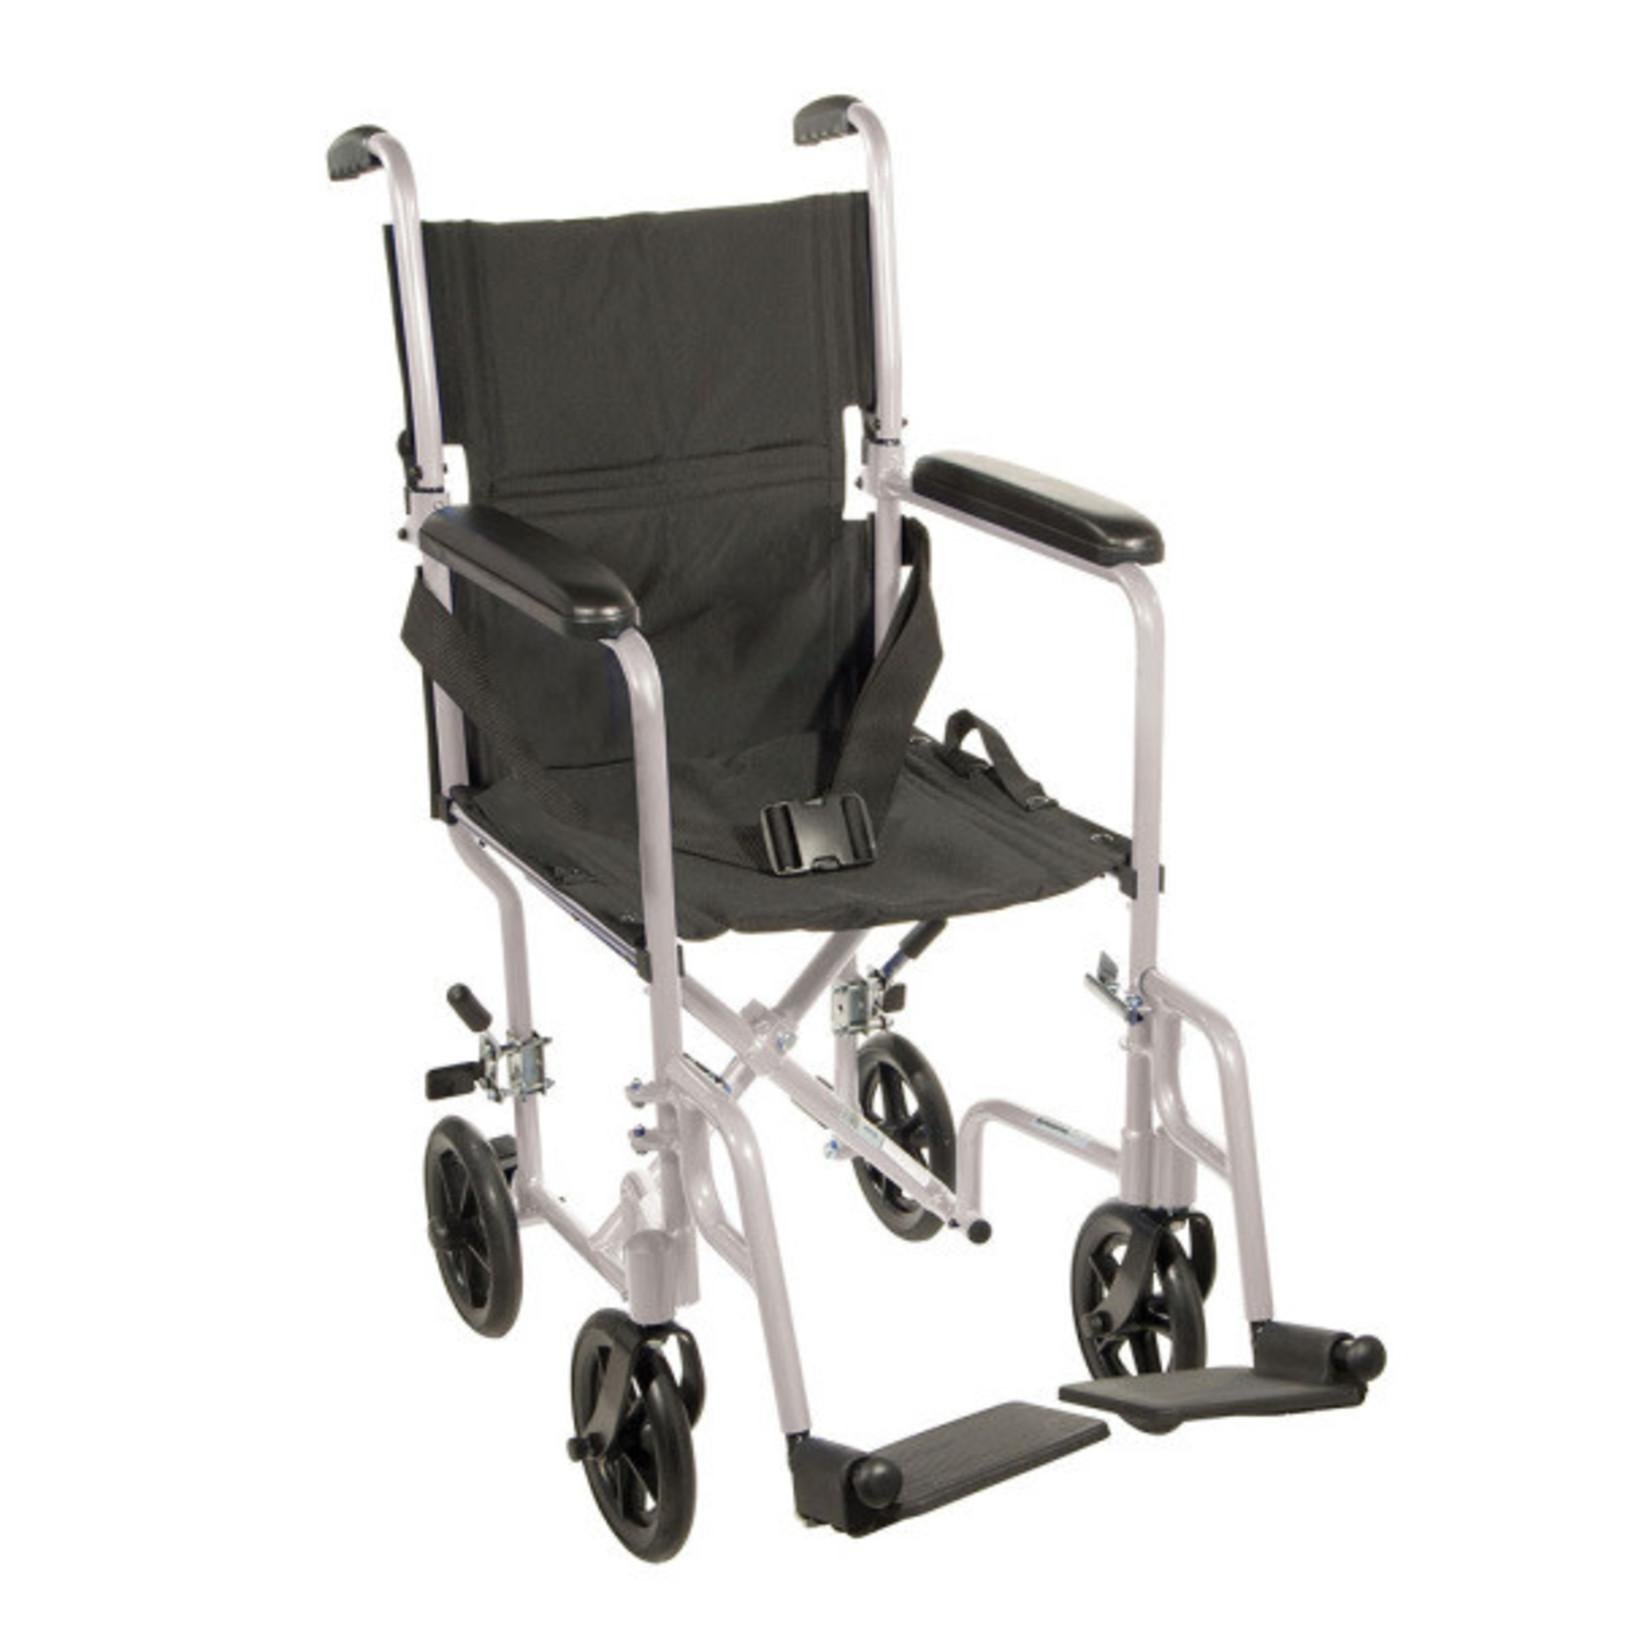 Drive Transport Chair - Standard